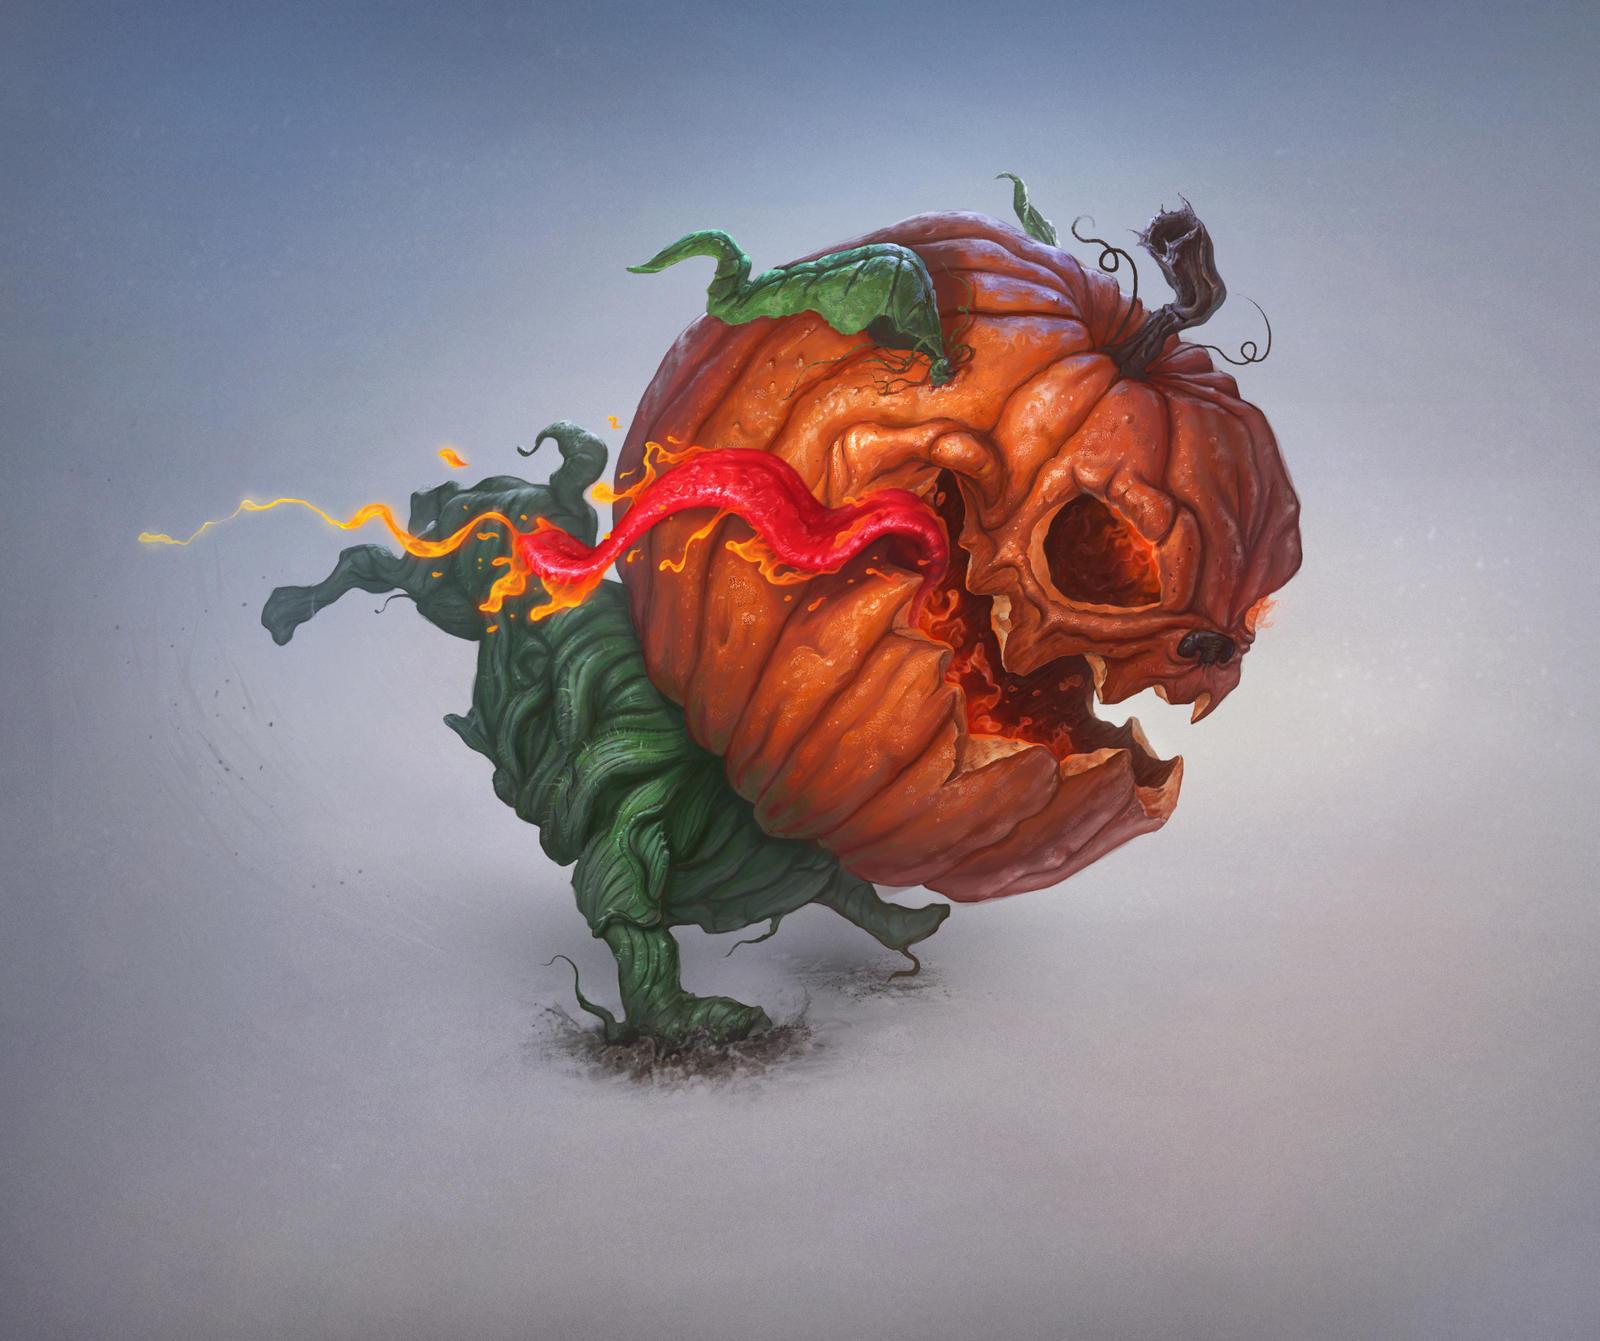 Pumpkin-dog by AlexeyZaporozhets